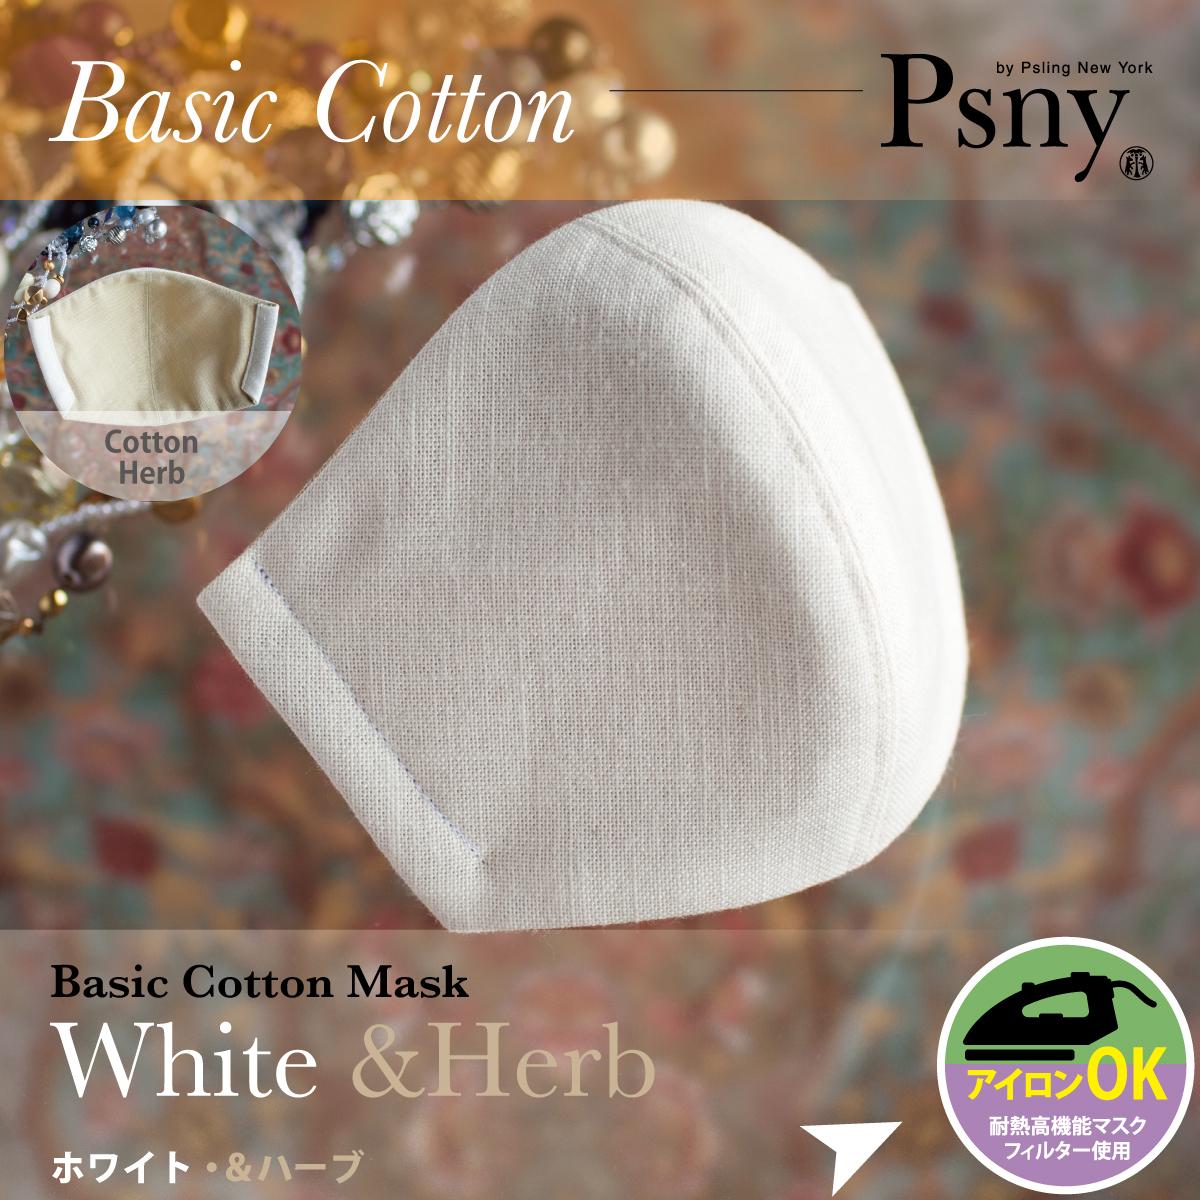 PSNY ベーシックコットン・オフホワイト(&ハーブ) 花粉 黄砂 洗えるフィルター入り 立体 マスク 大人用 CW9